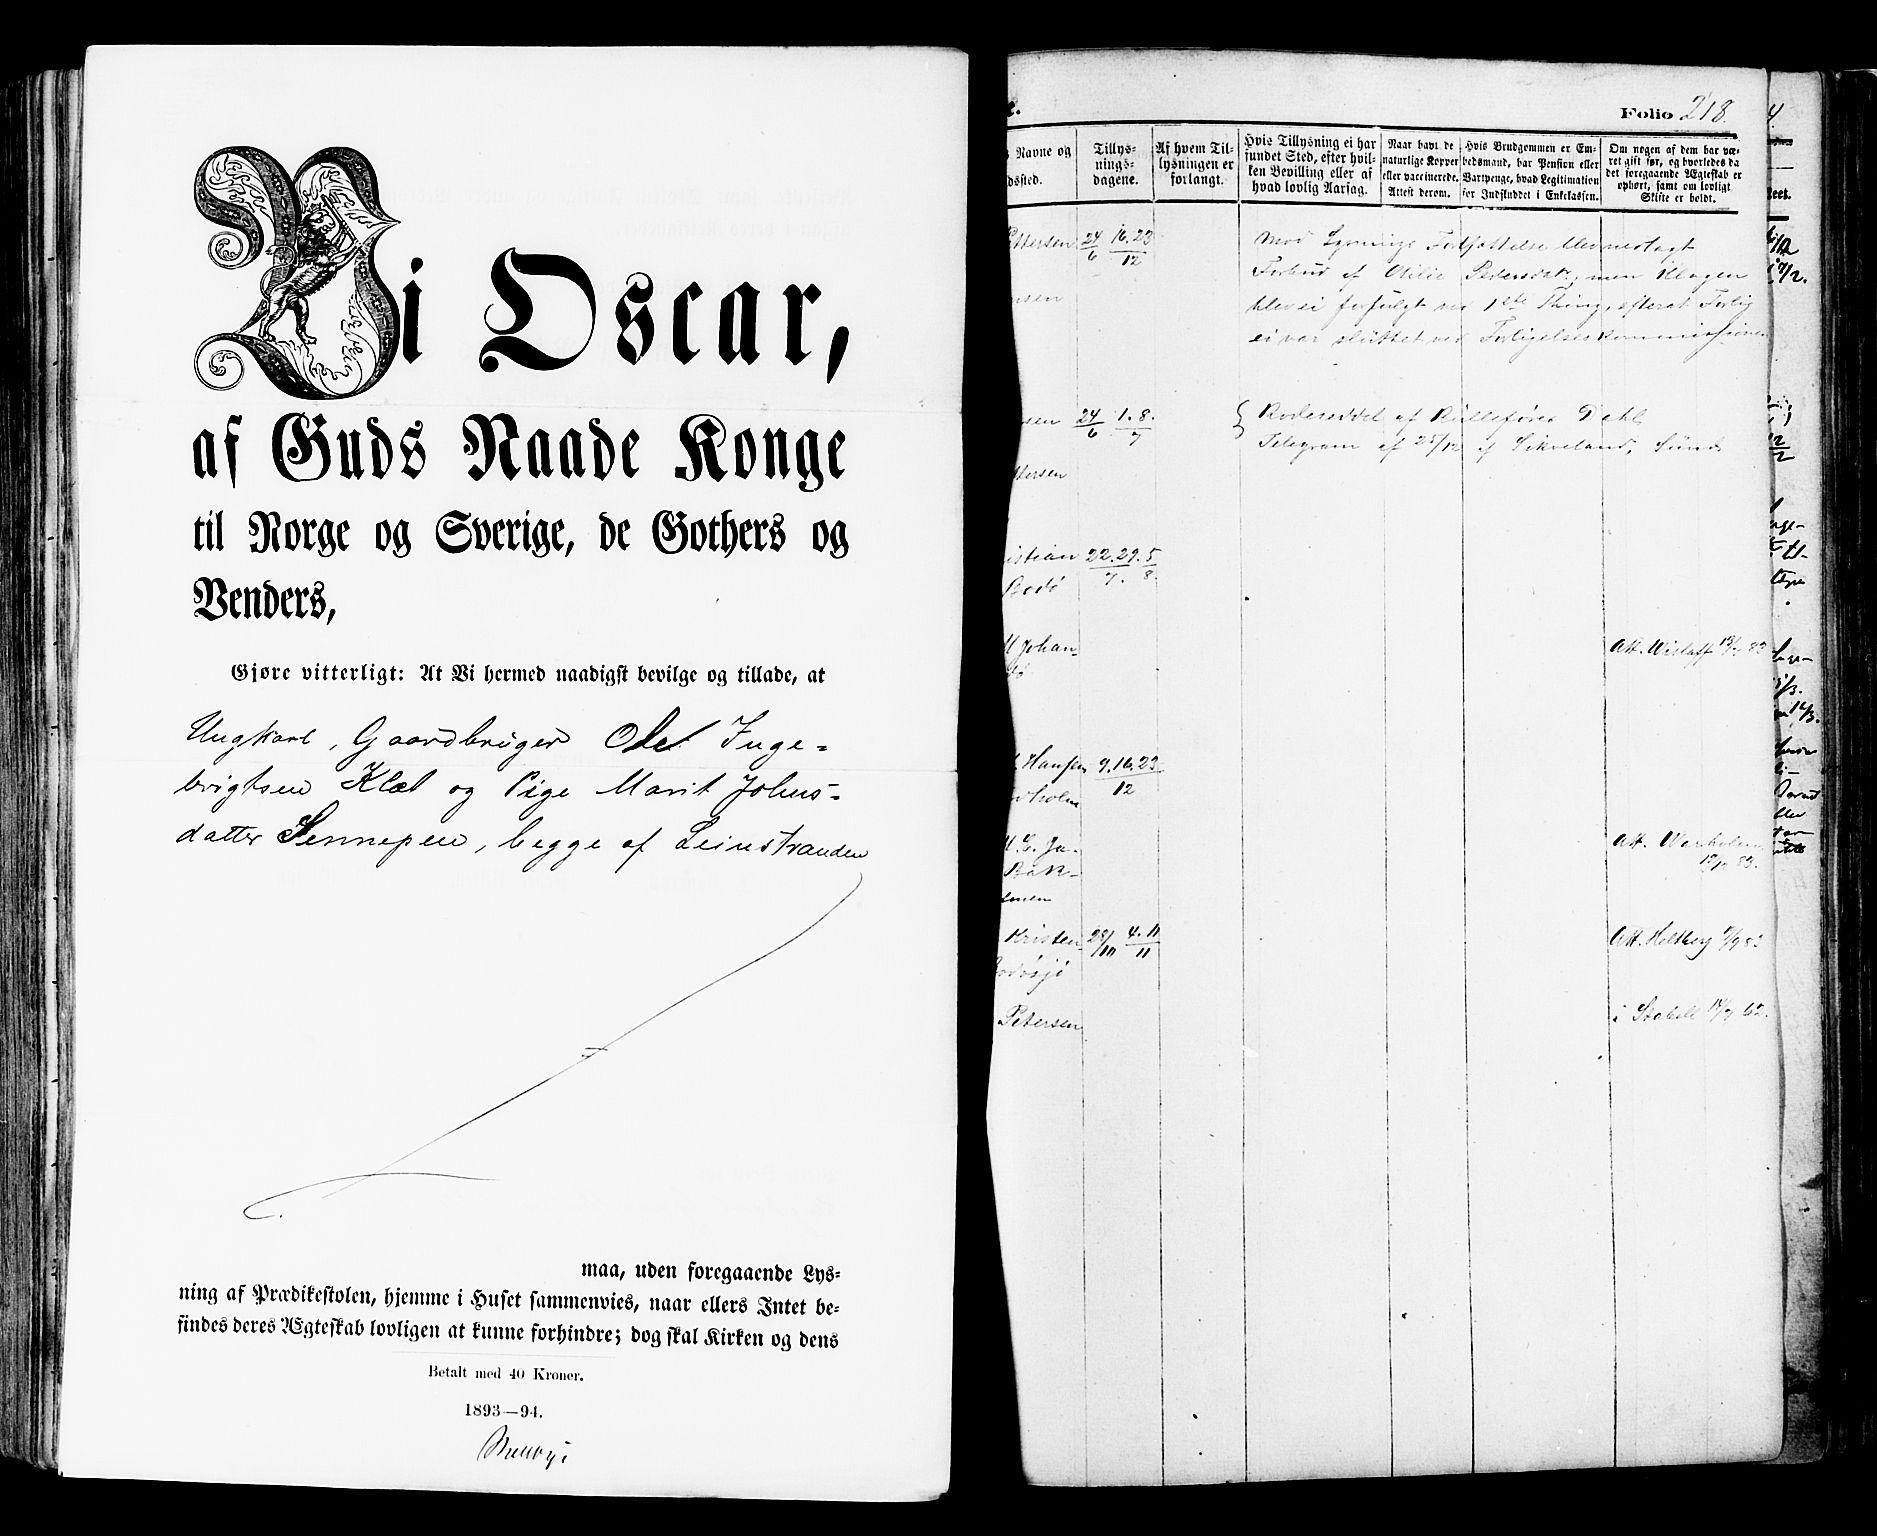 SAT, Ministerialprotokoller, klokkerbøker og fødselsregistre - Nordland, 801/L0009: Ministerialbok nr. 801A09, 1876-1883, s. 218